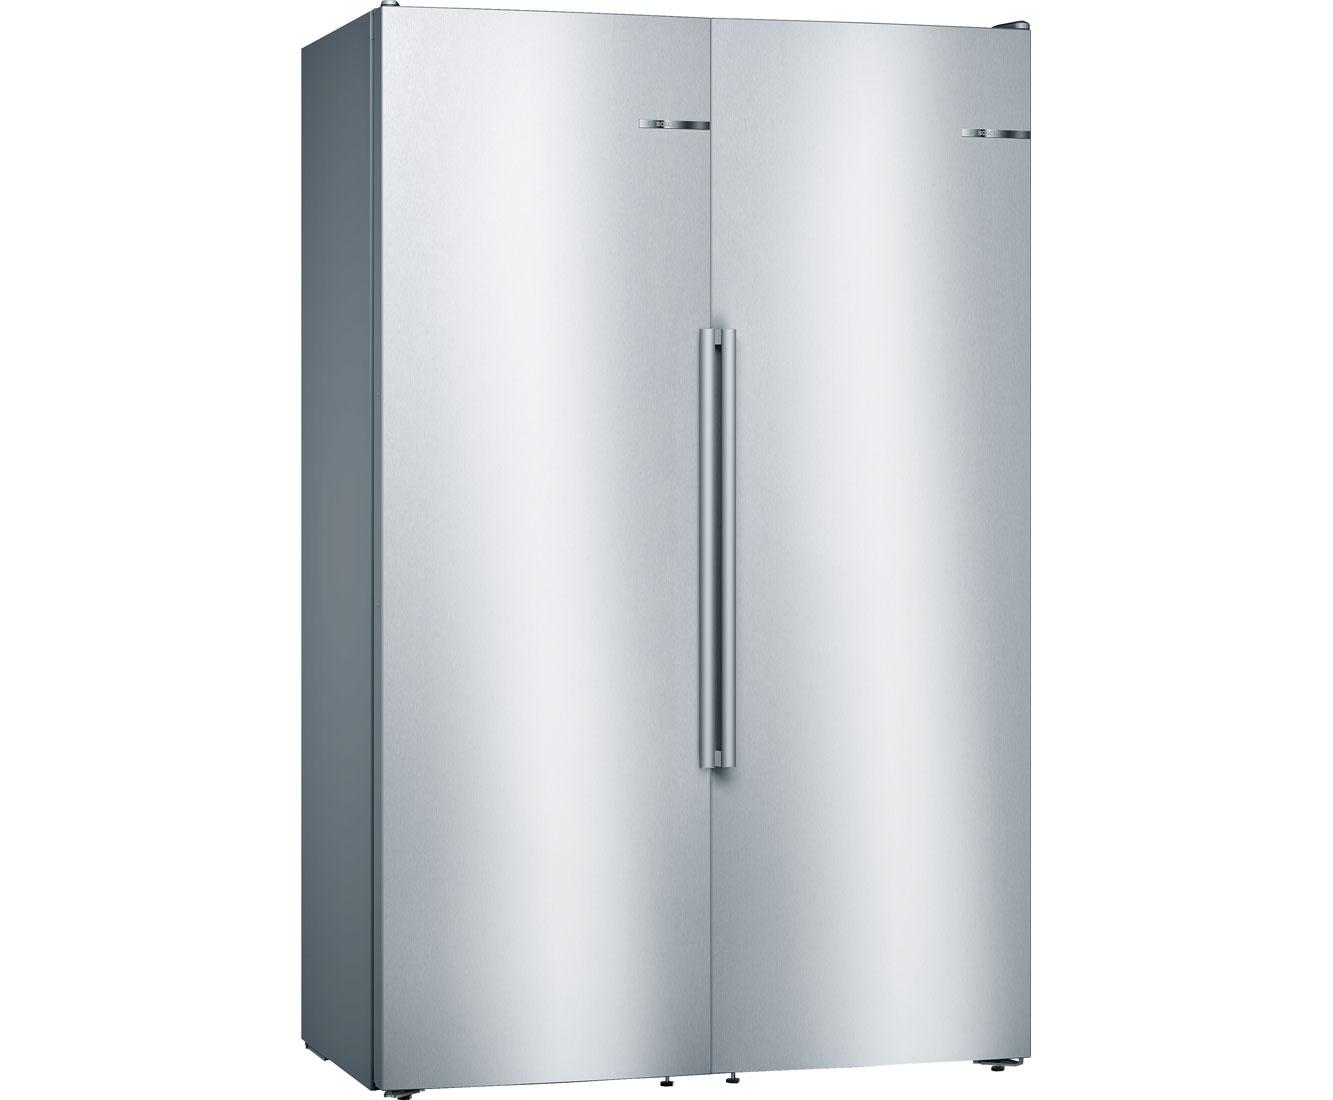 Neff Kühlschrank Side By Side : Neff ki 735 energieeffiziente kühlschränke auf smartricity